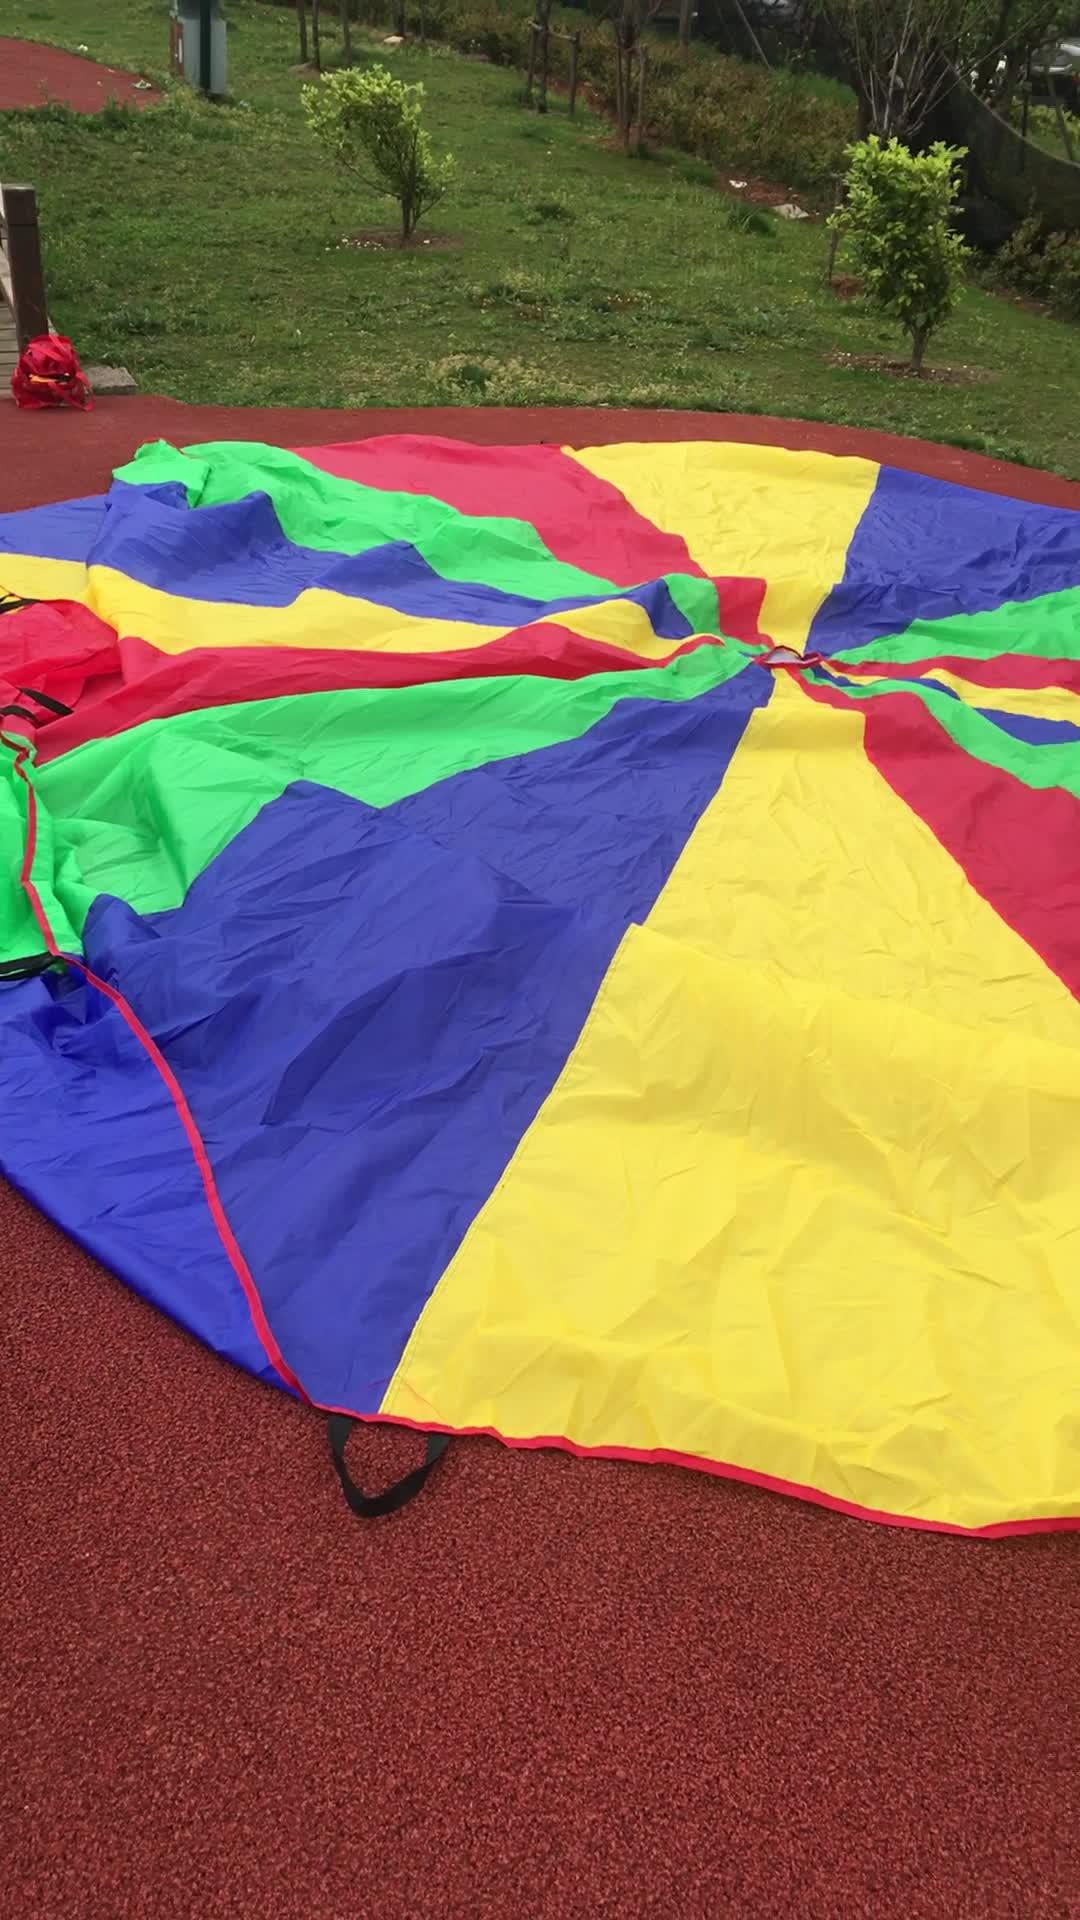 Regenbogen Kinder Spielen Fallschirm, indoor spiele kinder spielen-DIA.1METER, 3,5 M, 5M